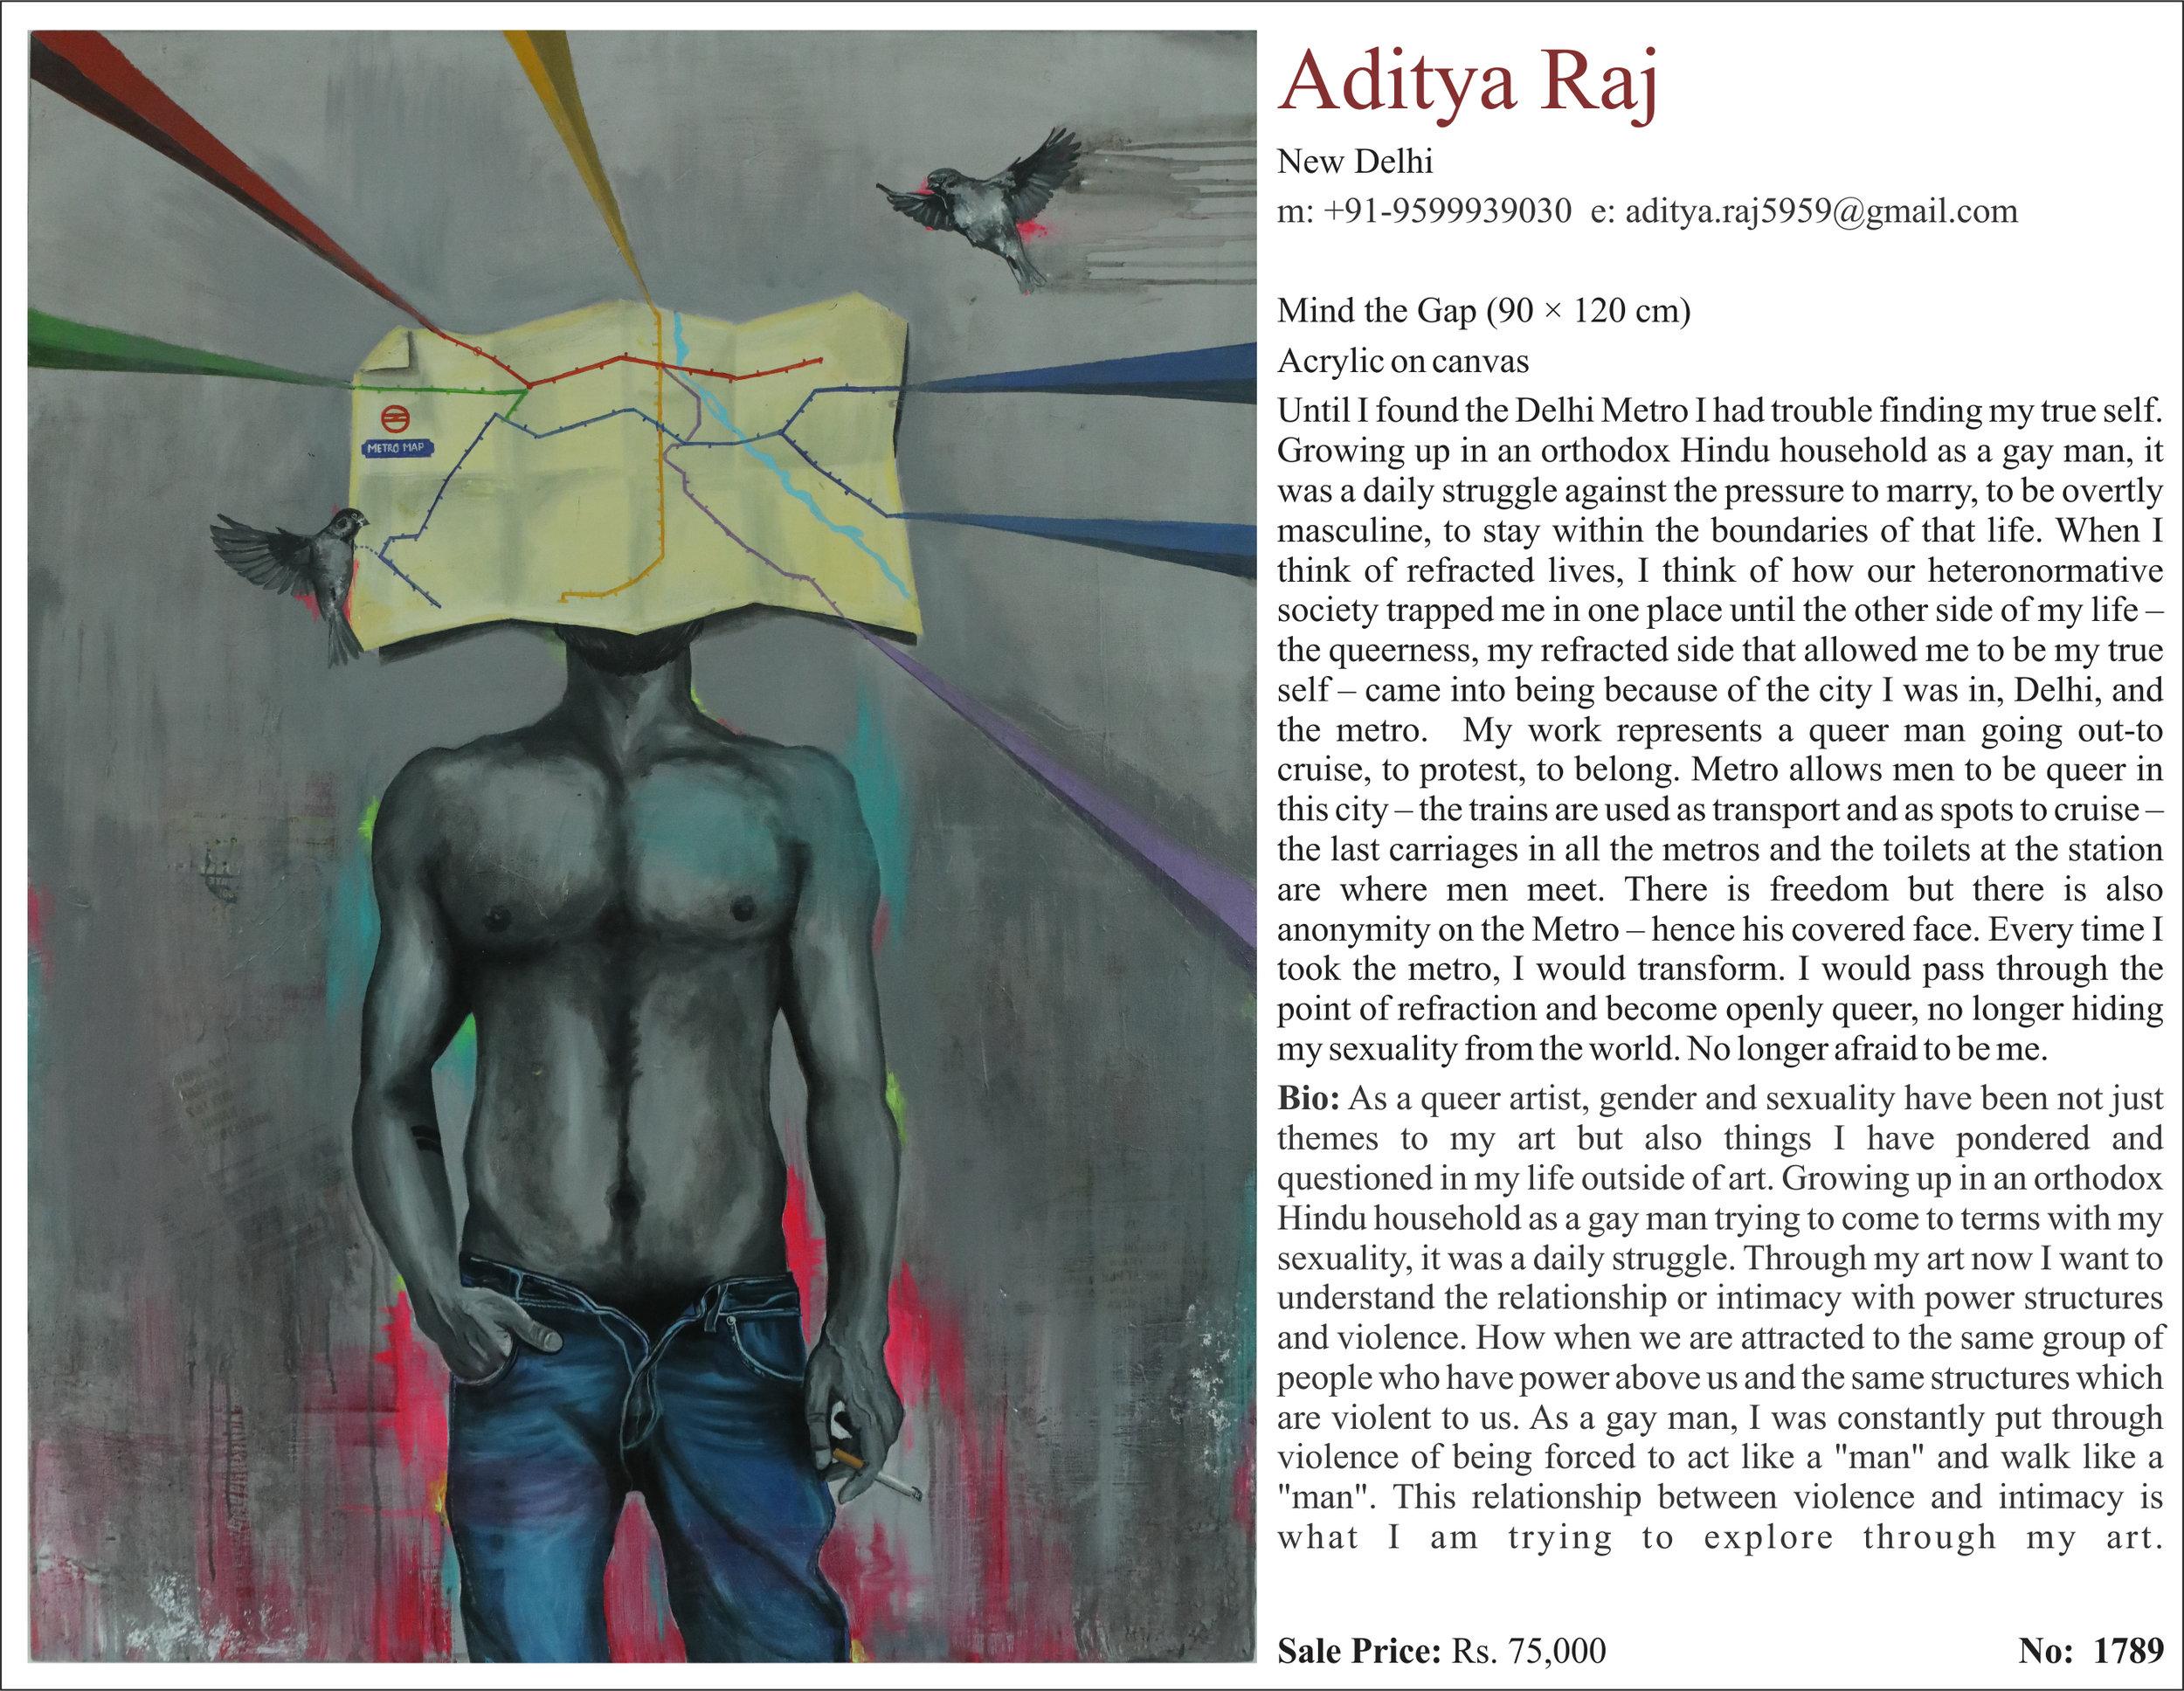 5.Aditya Raj.jpg